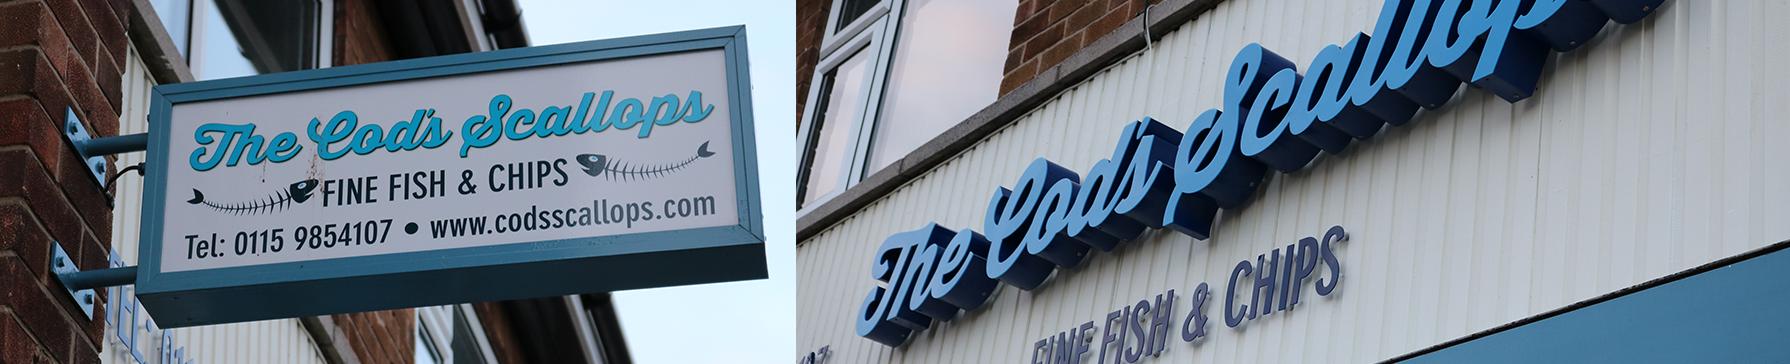 Clockwork Signs Cod Scallop Restaurant Bramcote Signage Pics